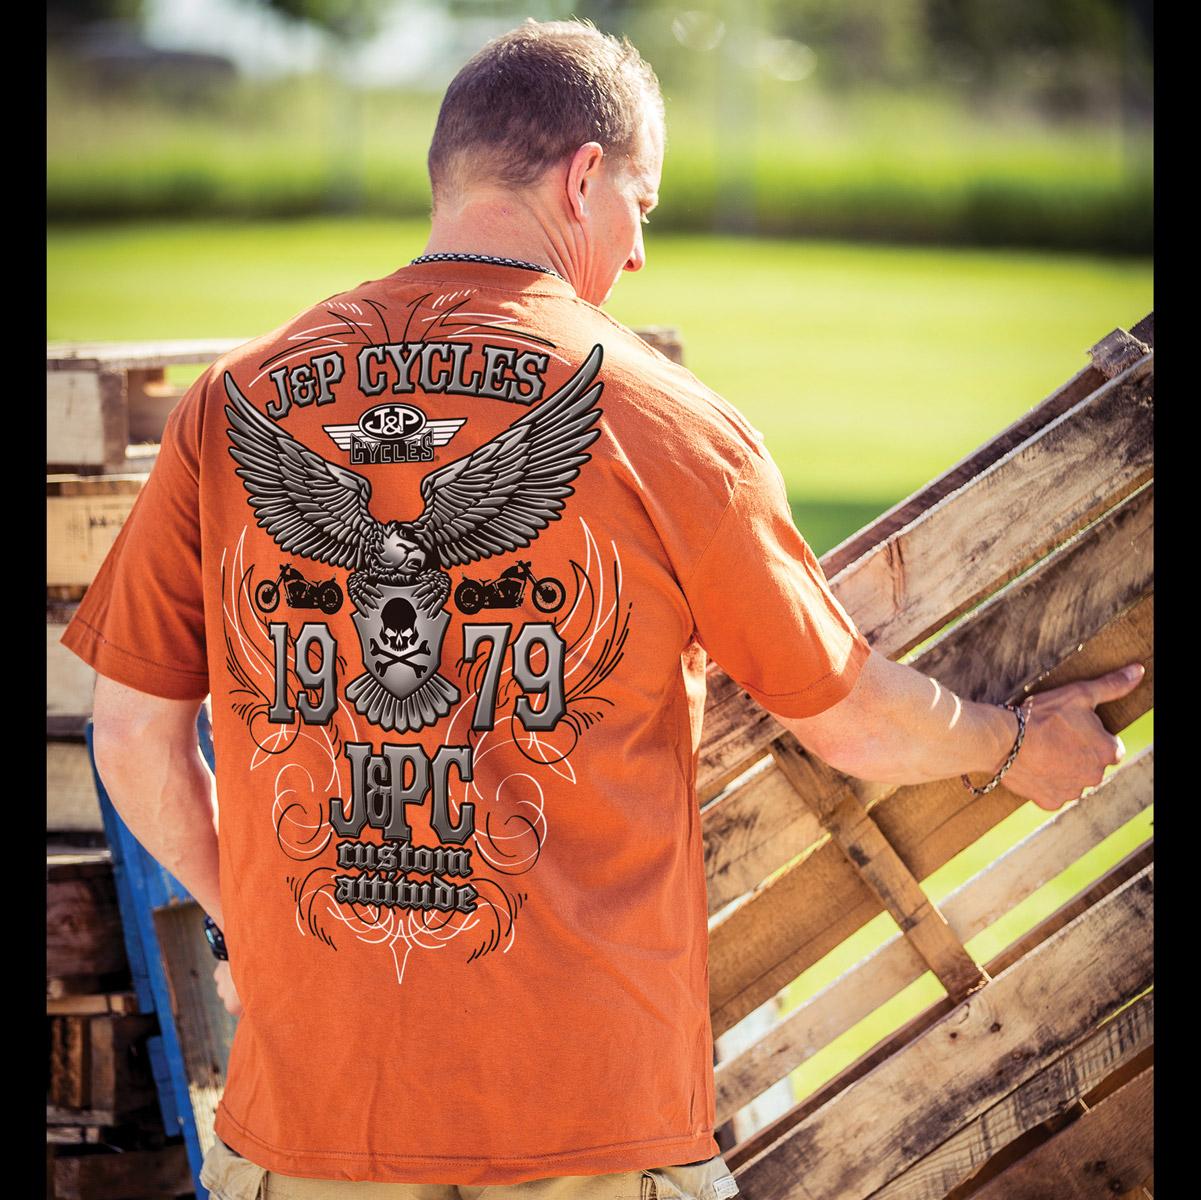 J&P Cycles® Pinstripe Chrome Texas Orange T-Shirt